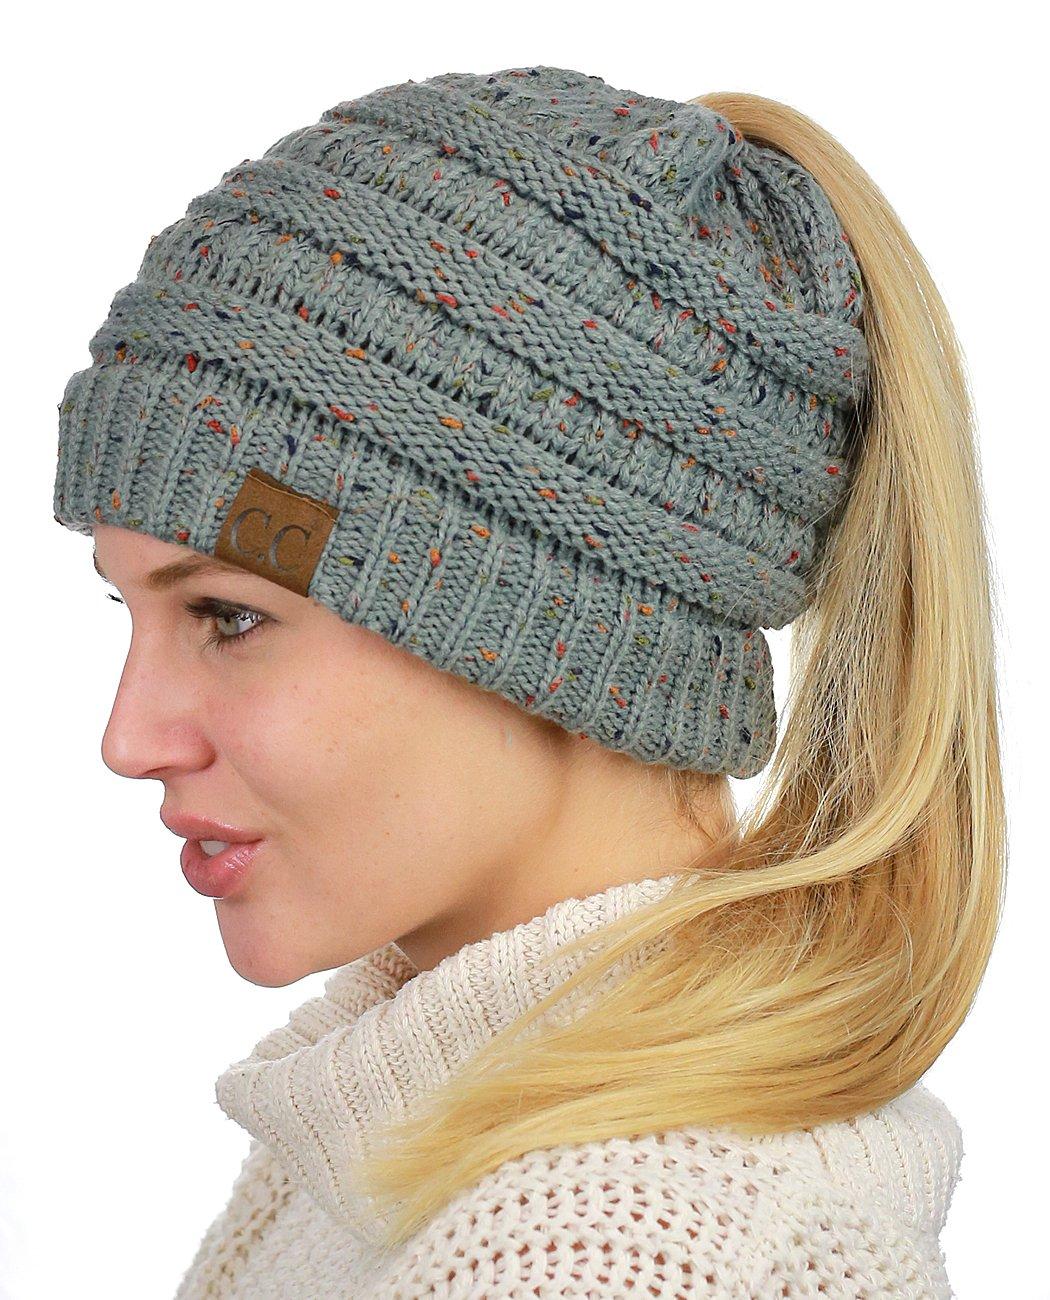 974a517d2c0 C.C BeanieTail Soft Stretch Cable Knit Messy High Bun Ponytail Beanie Hat